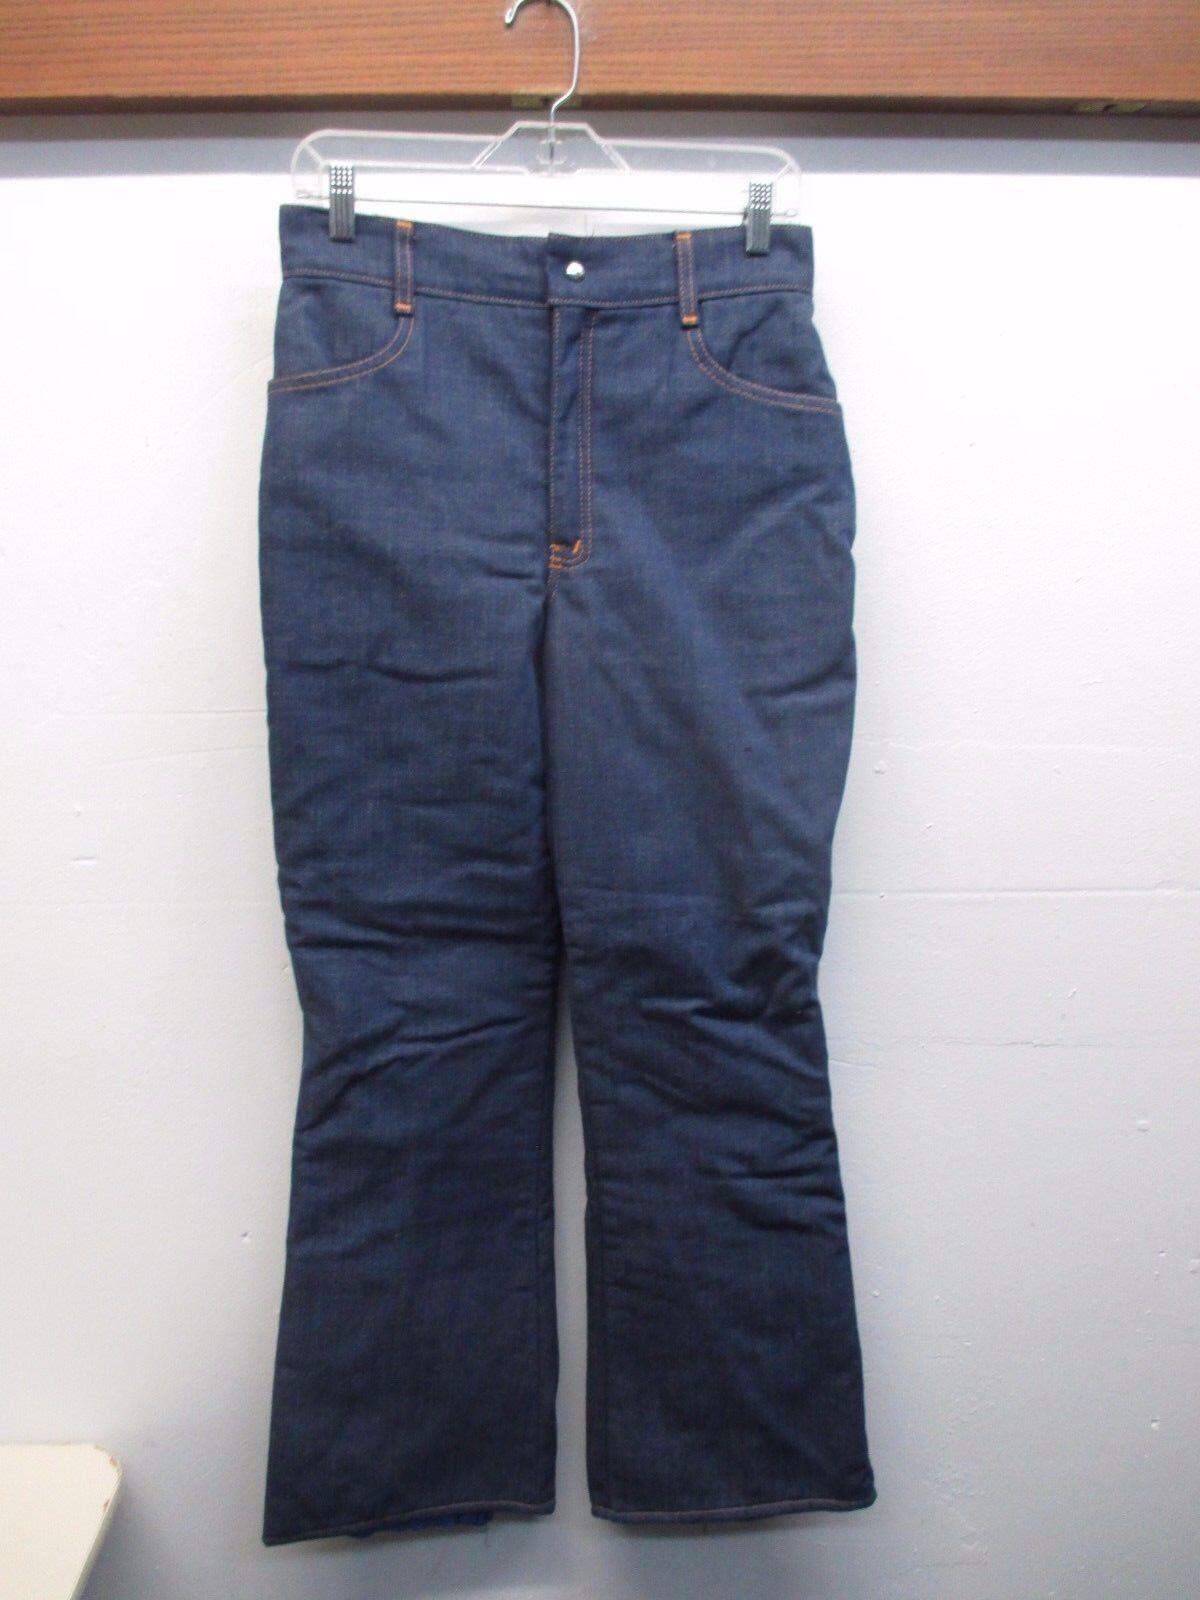 Athalon Products Women's 1970's Vintage Denim Shell  Snow Ski Pants (Size M)